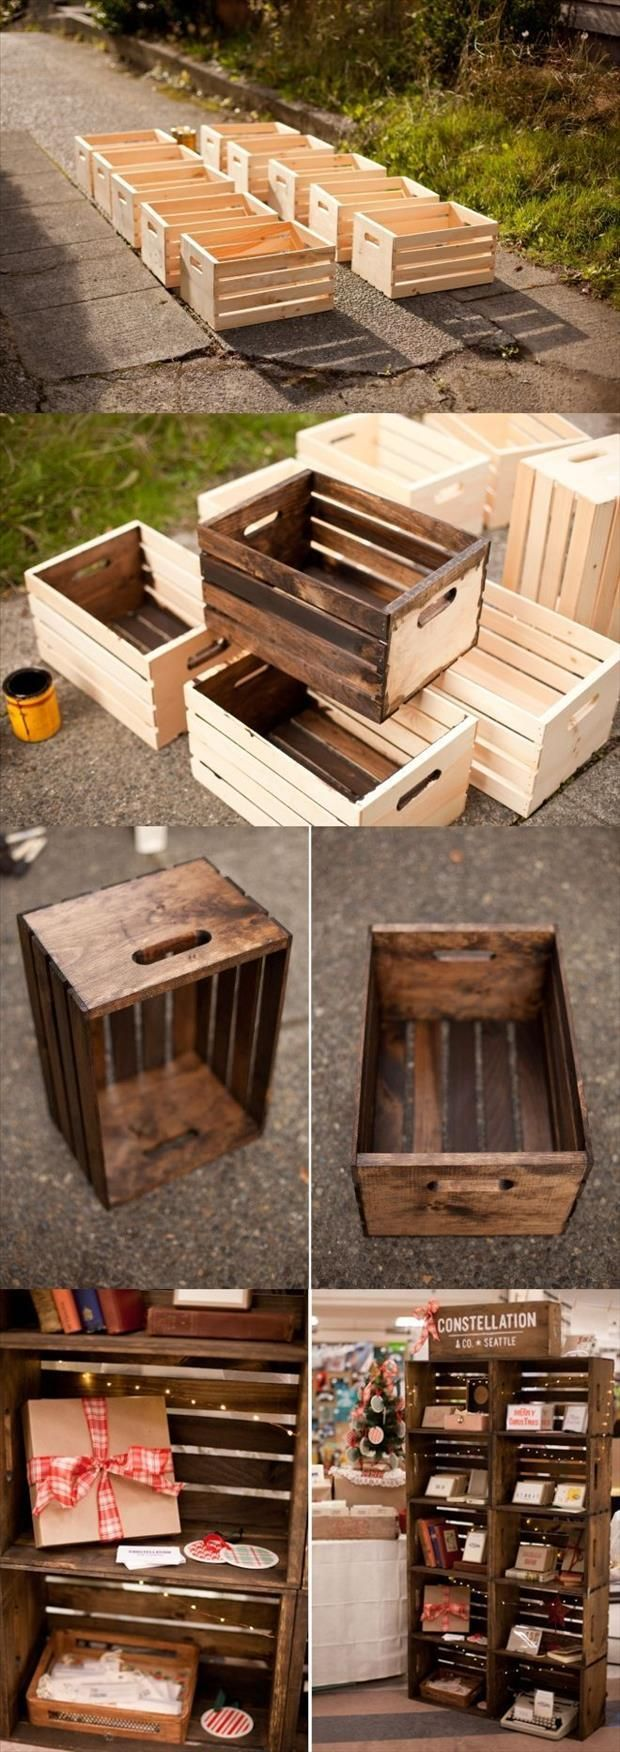 Cheap Living Room Decorating Ideas: 20+ DIY Wooden Crates Furniture Design Ideas